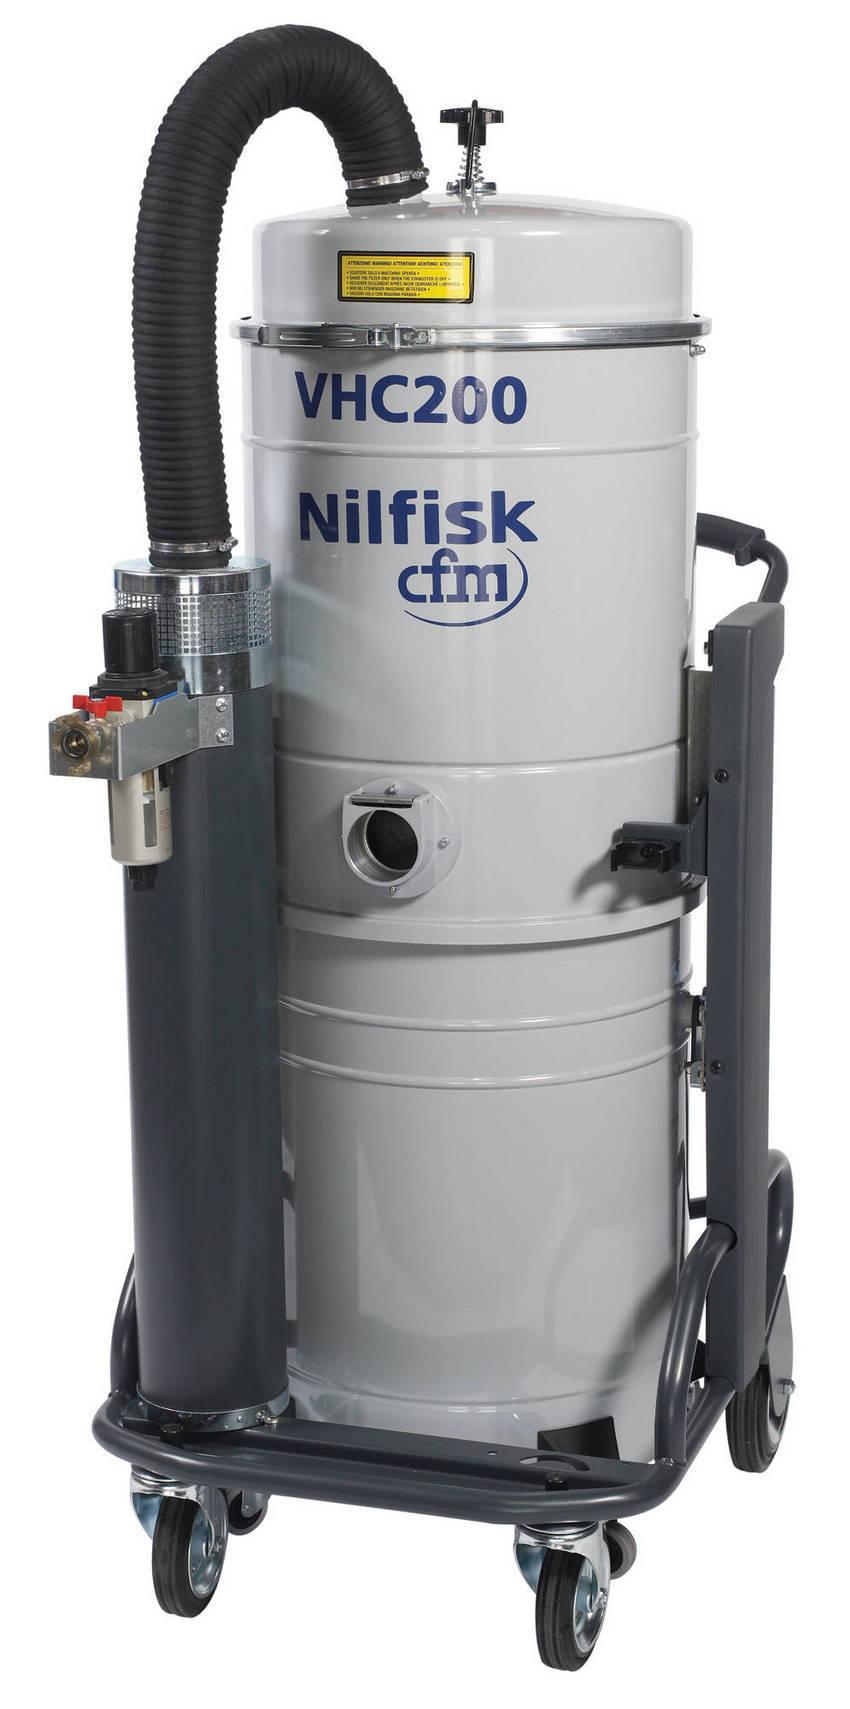 Air Powered Vacuum : Nilfisk industrial vacuums releases new air operated